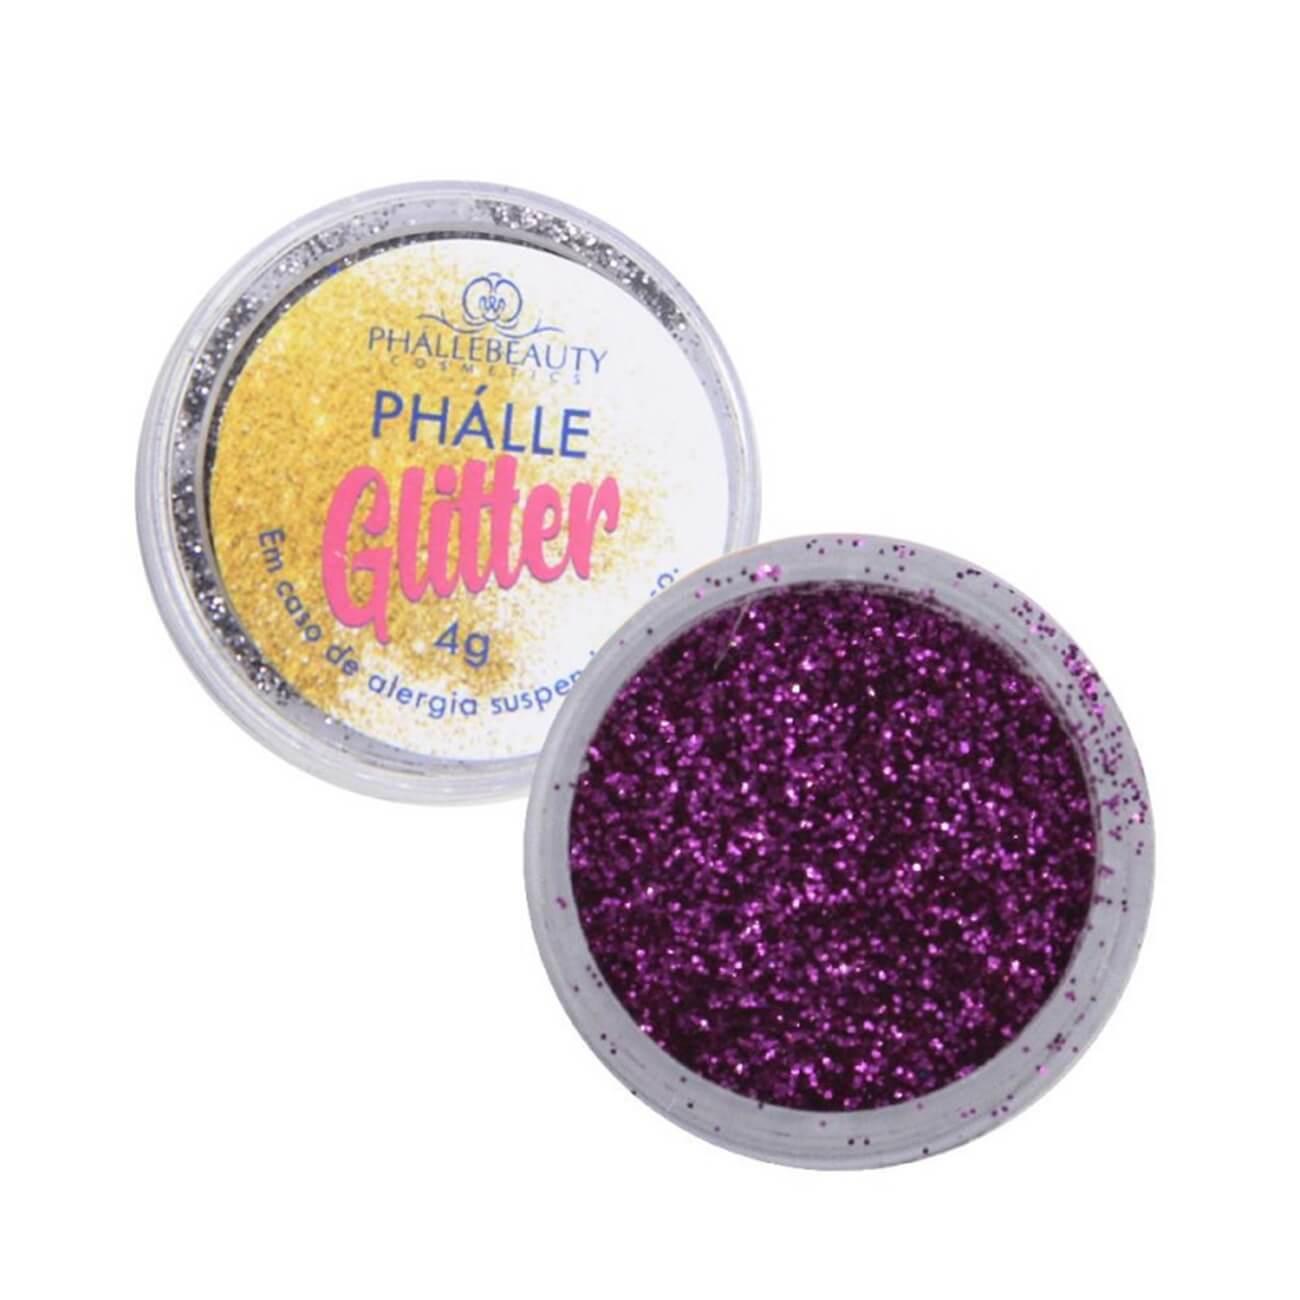 Glitter 4g - PhálleBeauty